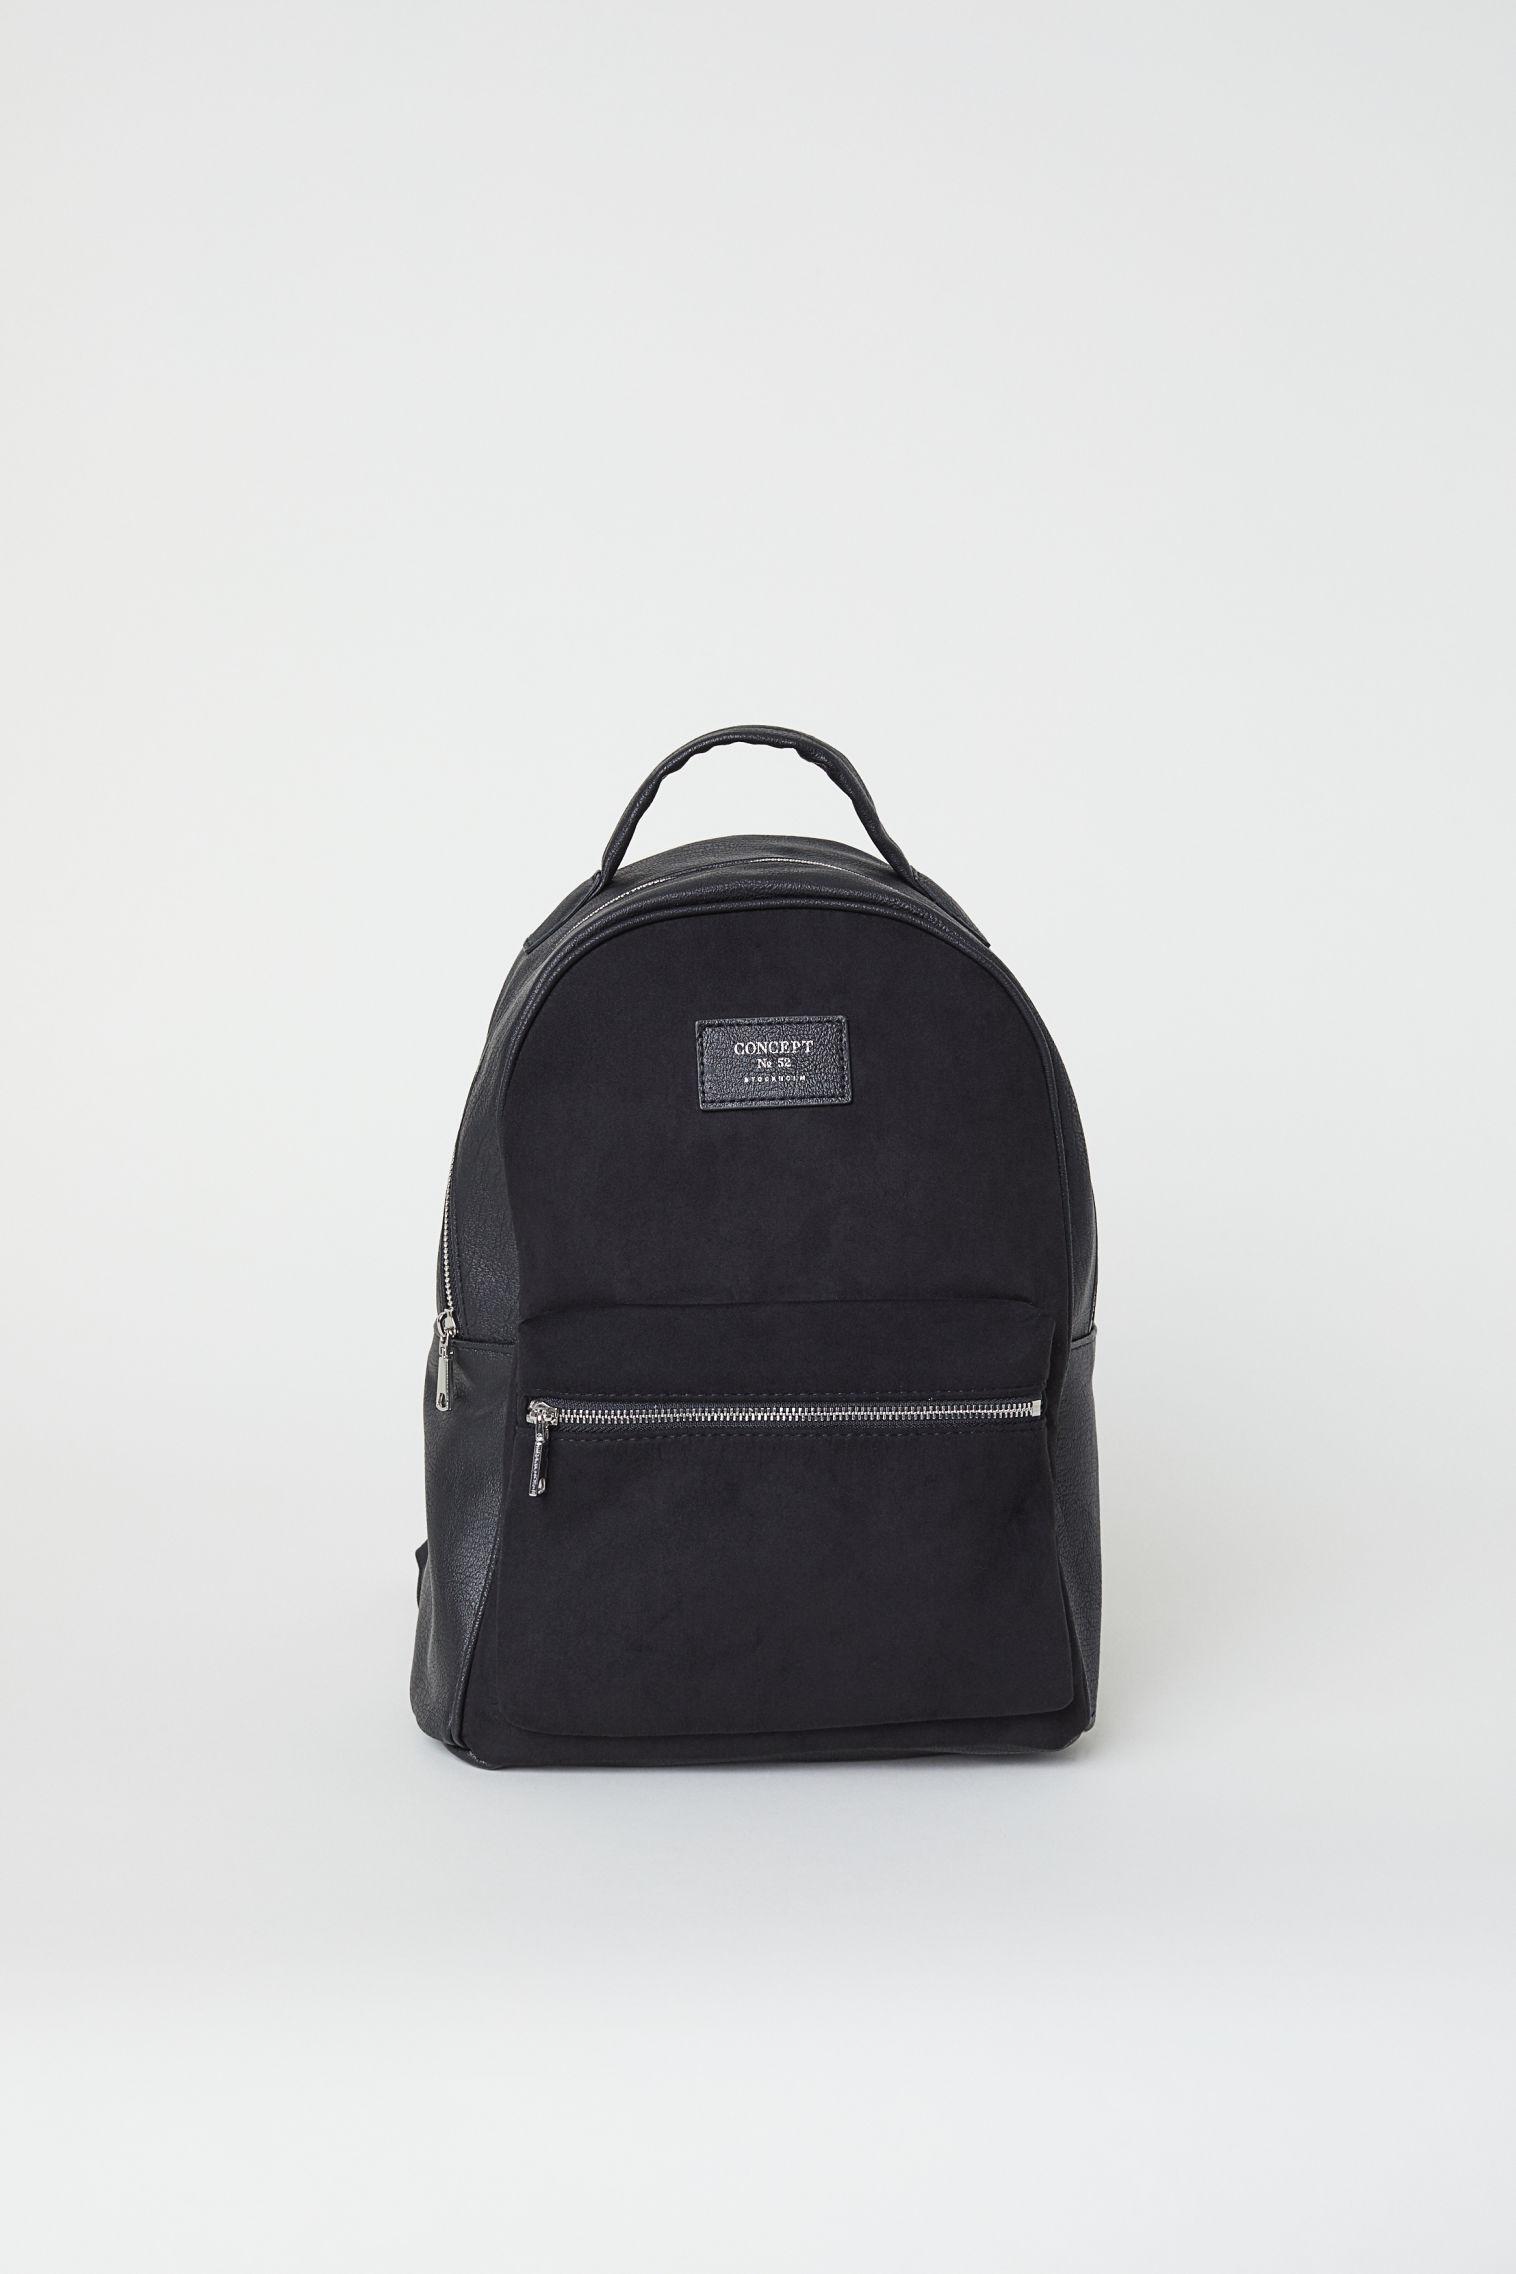 52d4e22f9f8 H M Backpack in Black - Lyst